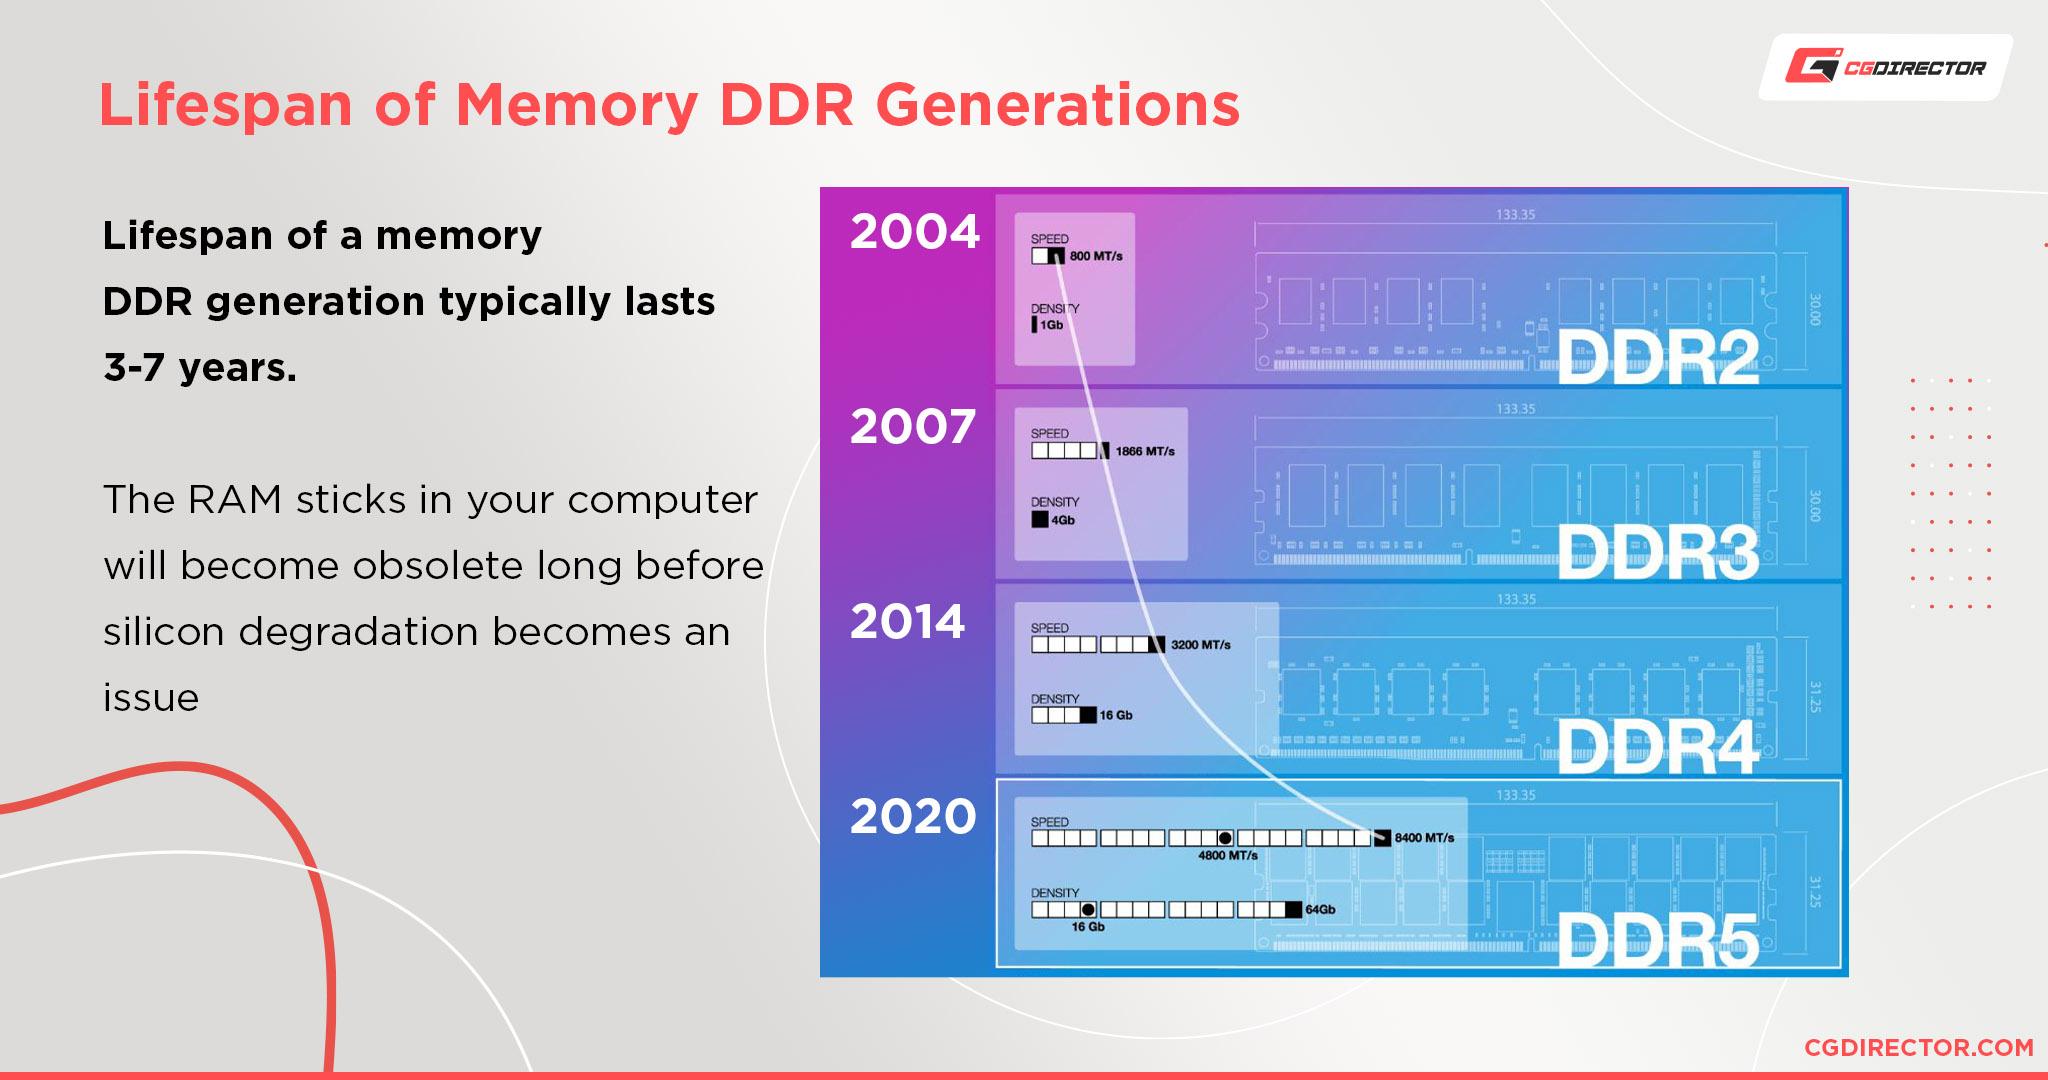 Lifespan of DDR Generations